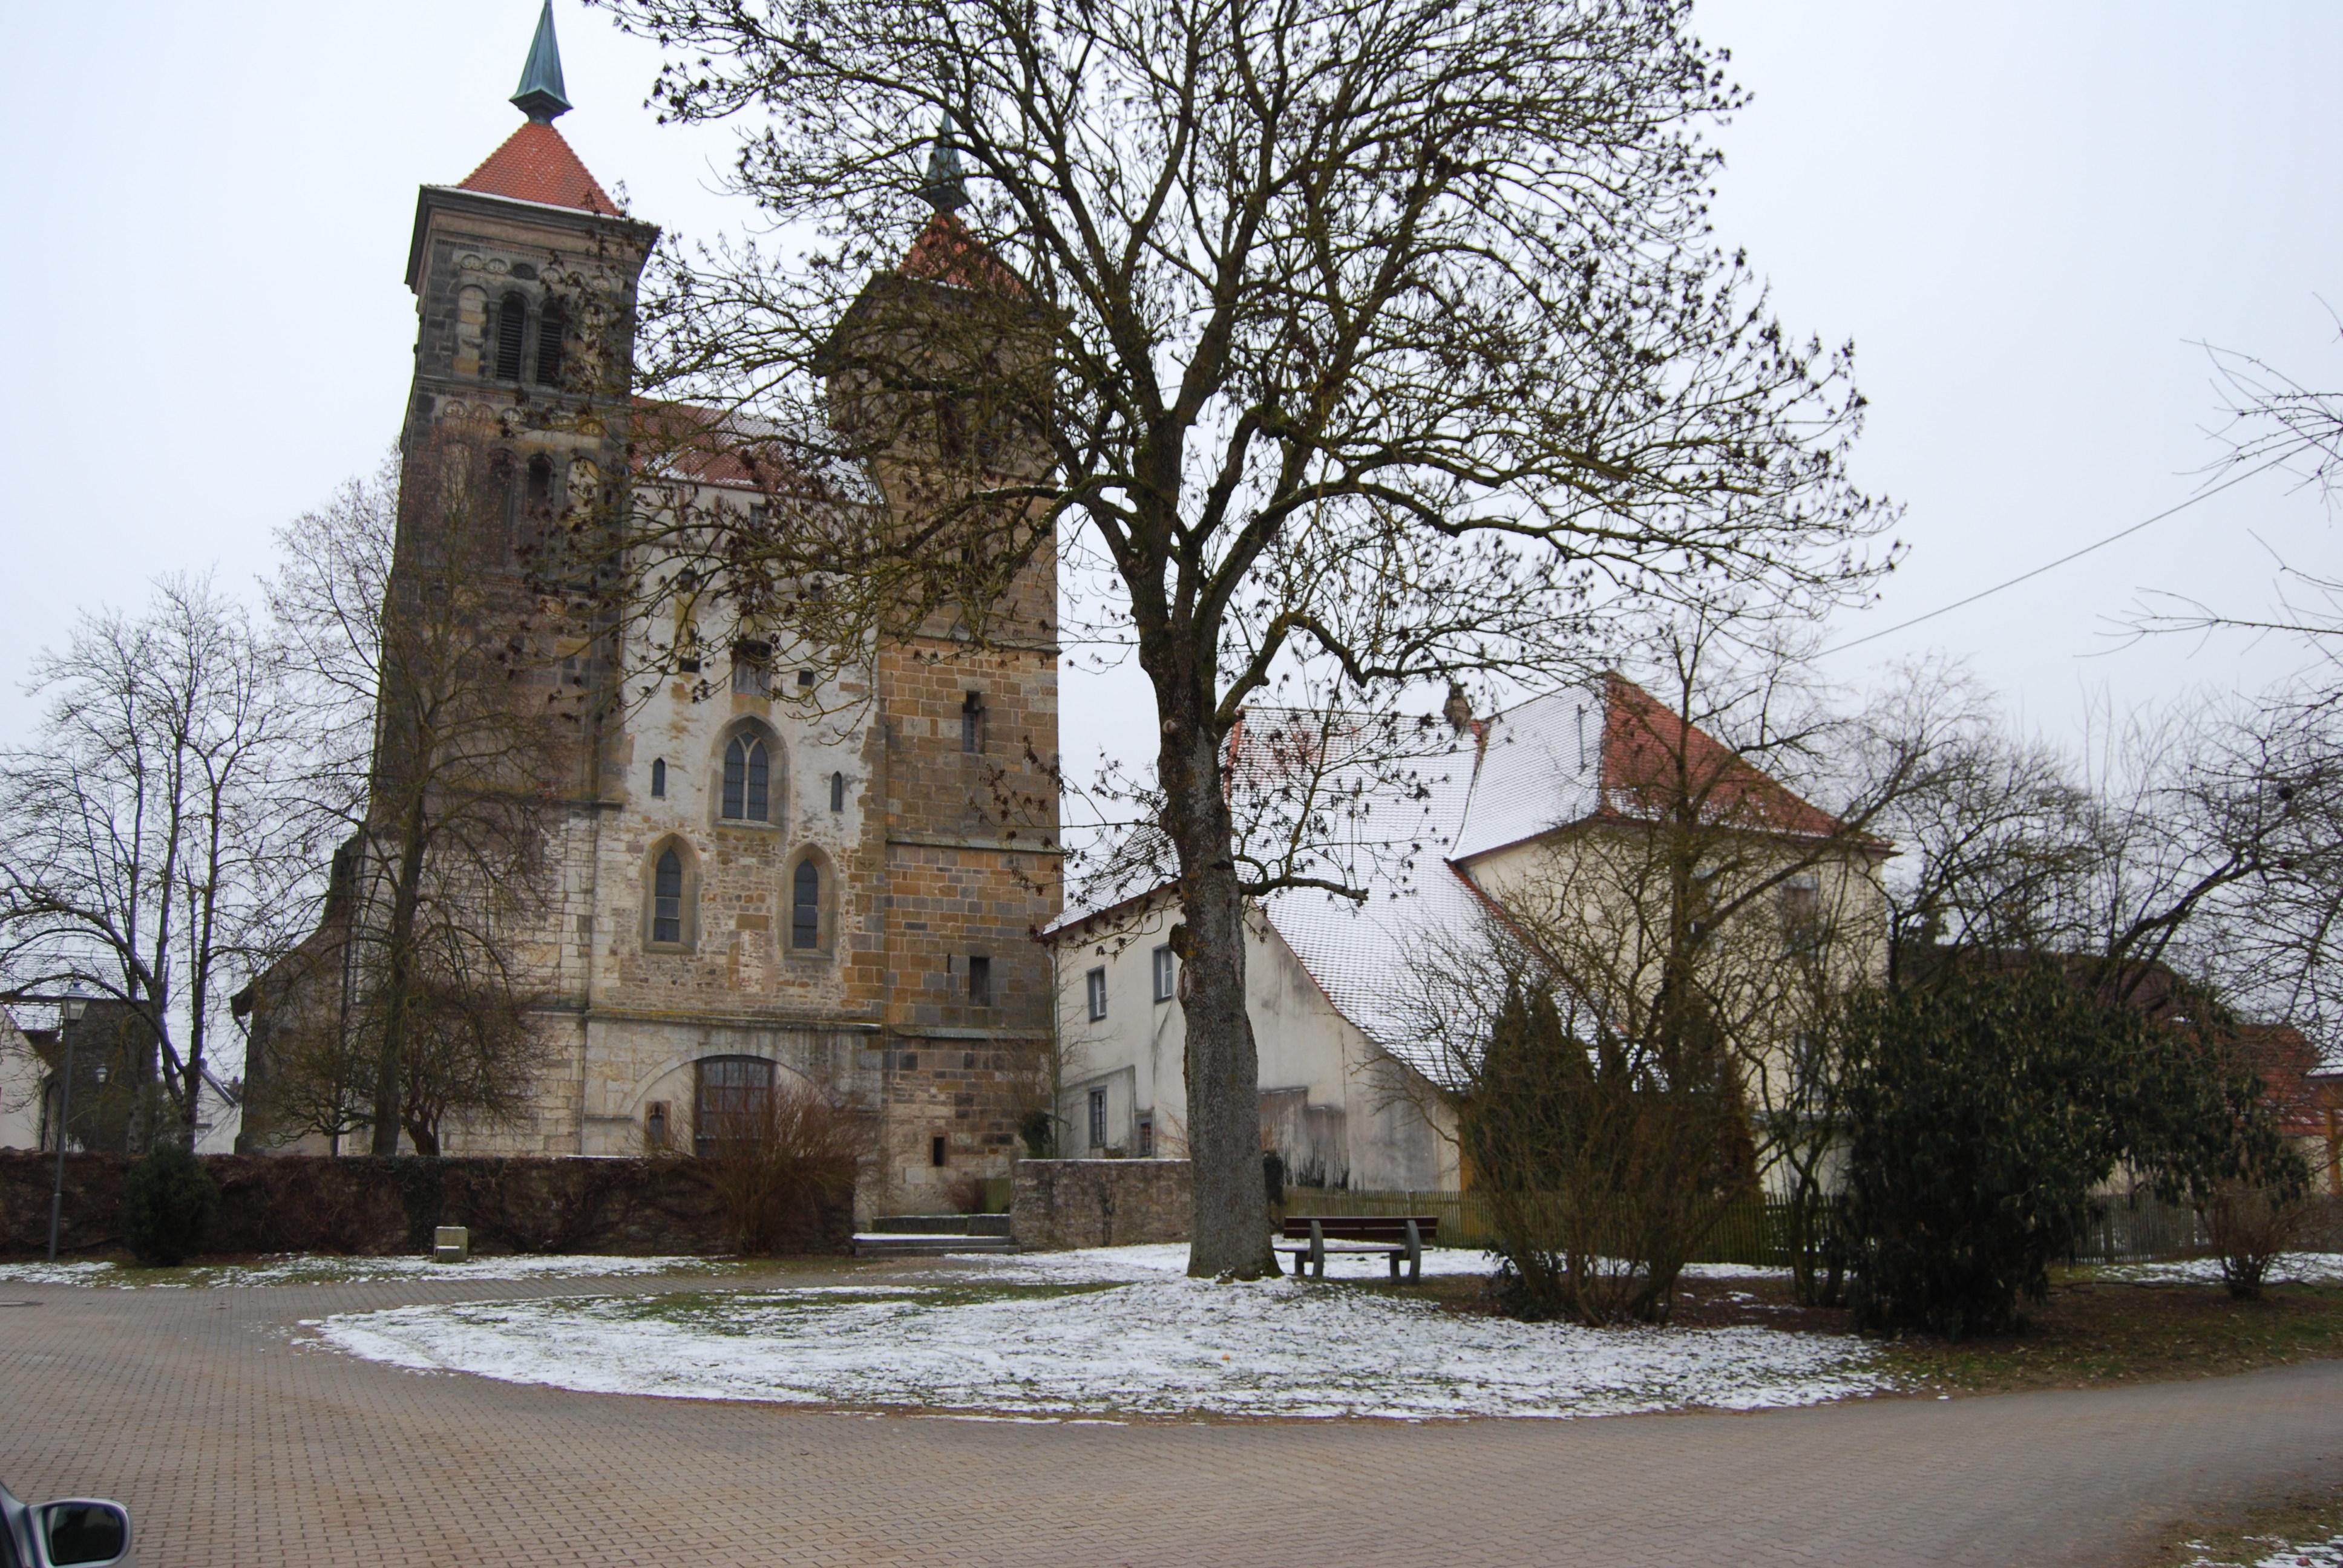 Kunstpfad Donau-Ries 2019